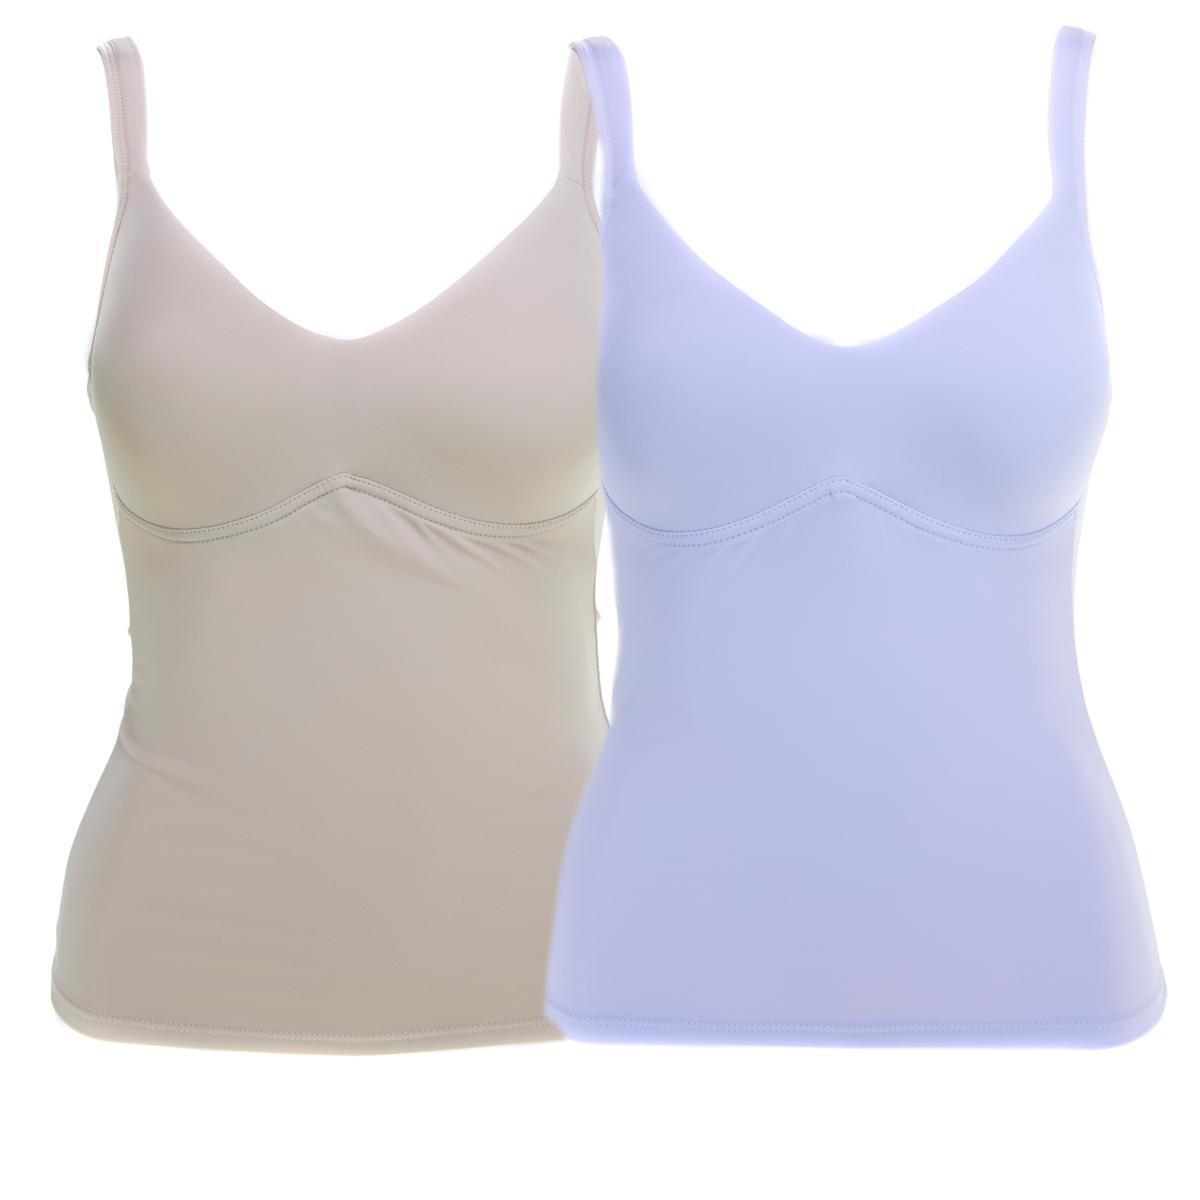 Rhonda Shear Everyday Molded Cup 2pk Camisole, Nude/Purple Heather, M (586-078)